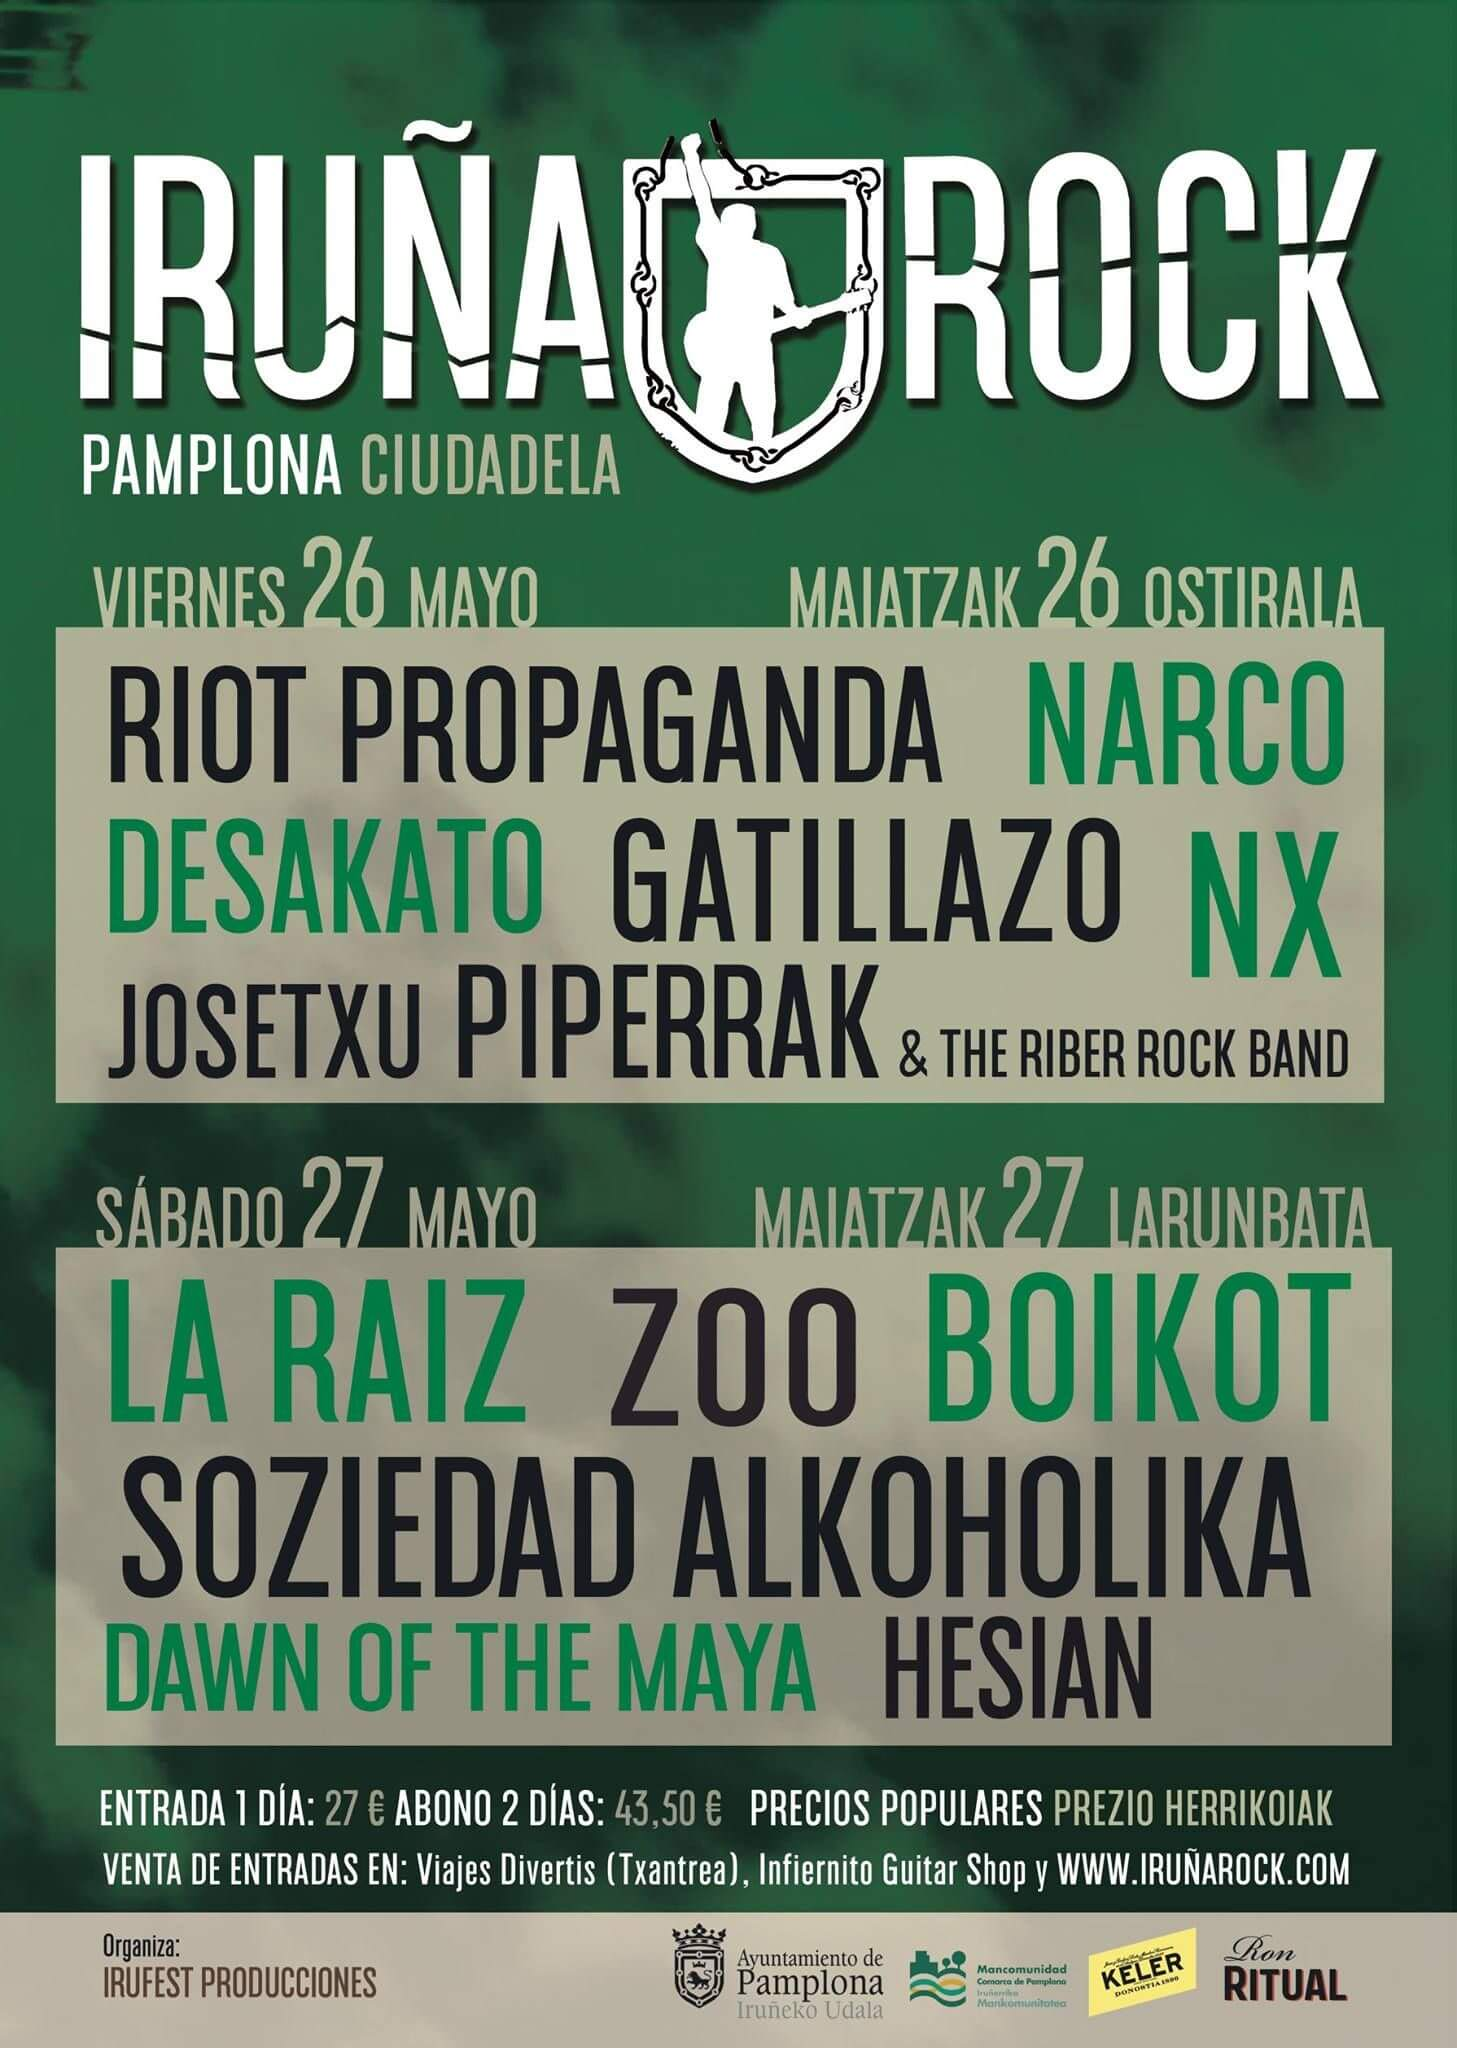 Festival Iruña Rock - Iruña (Navarra) @ Festival Iruña Rock | Pamplona | Navarra | España